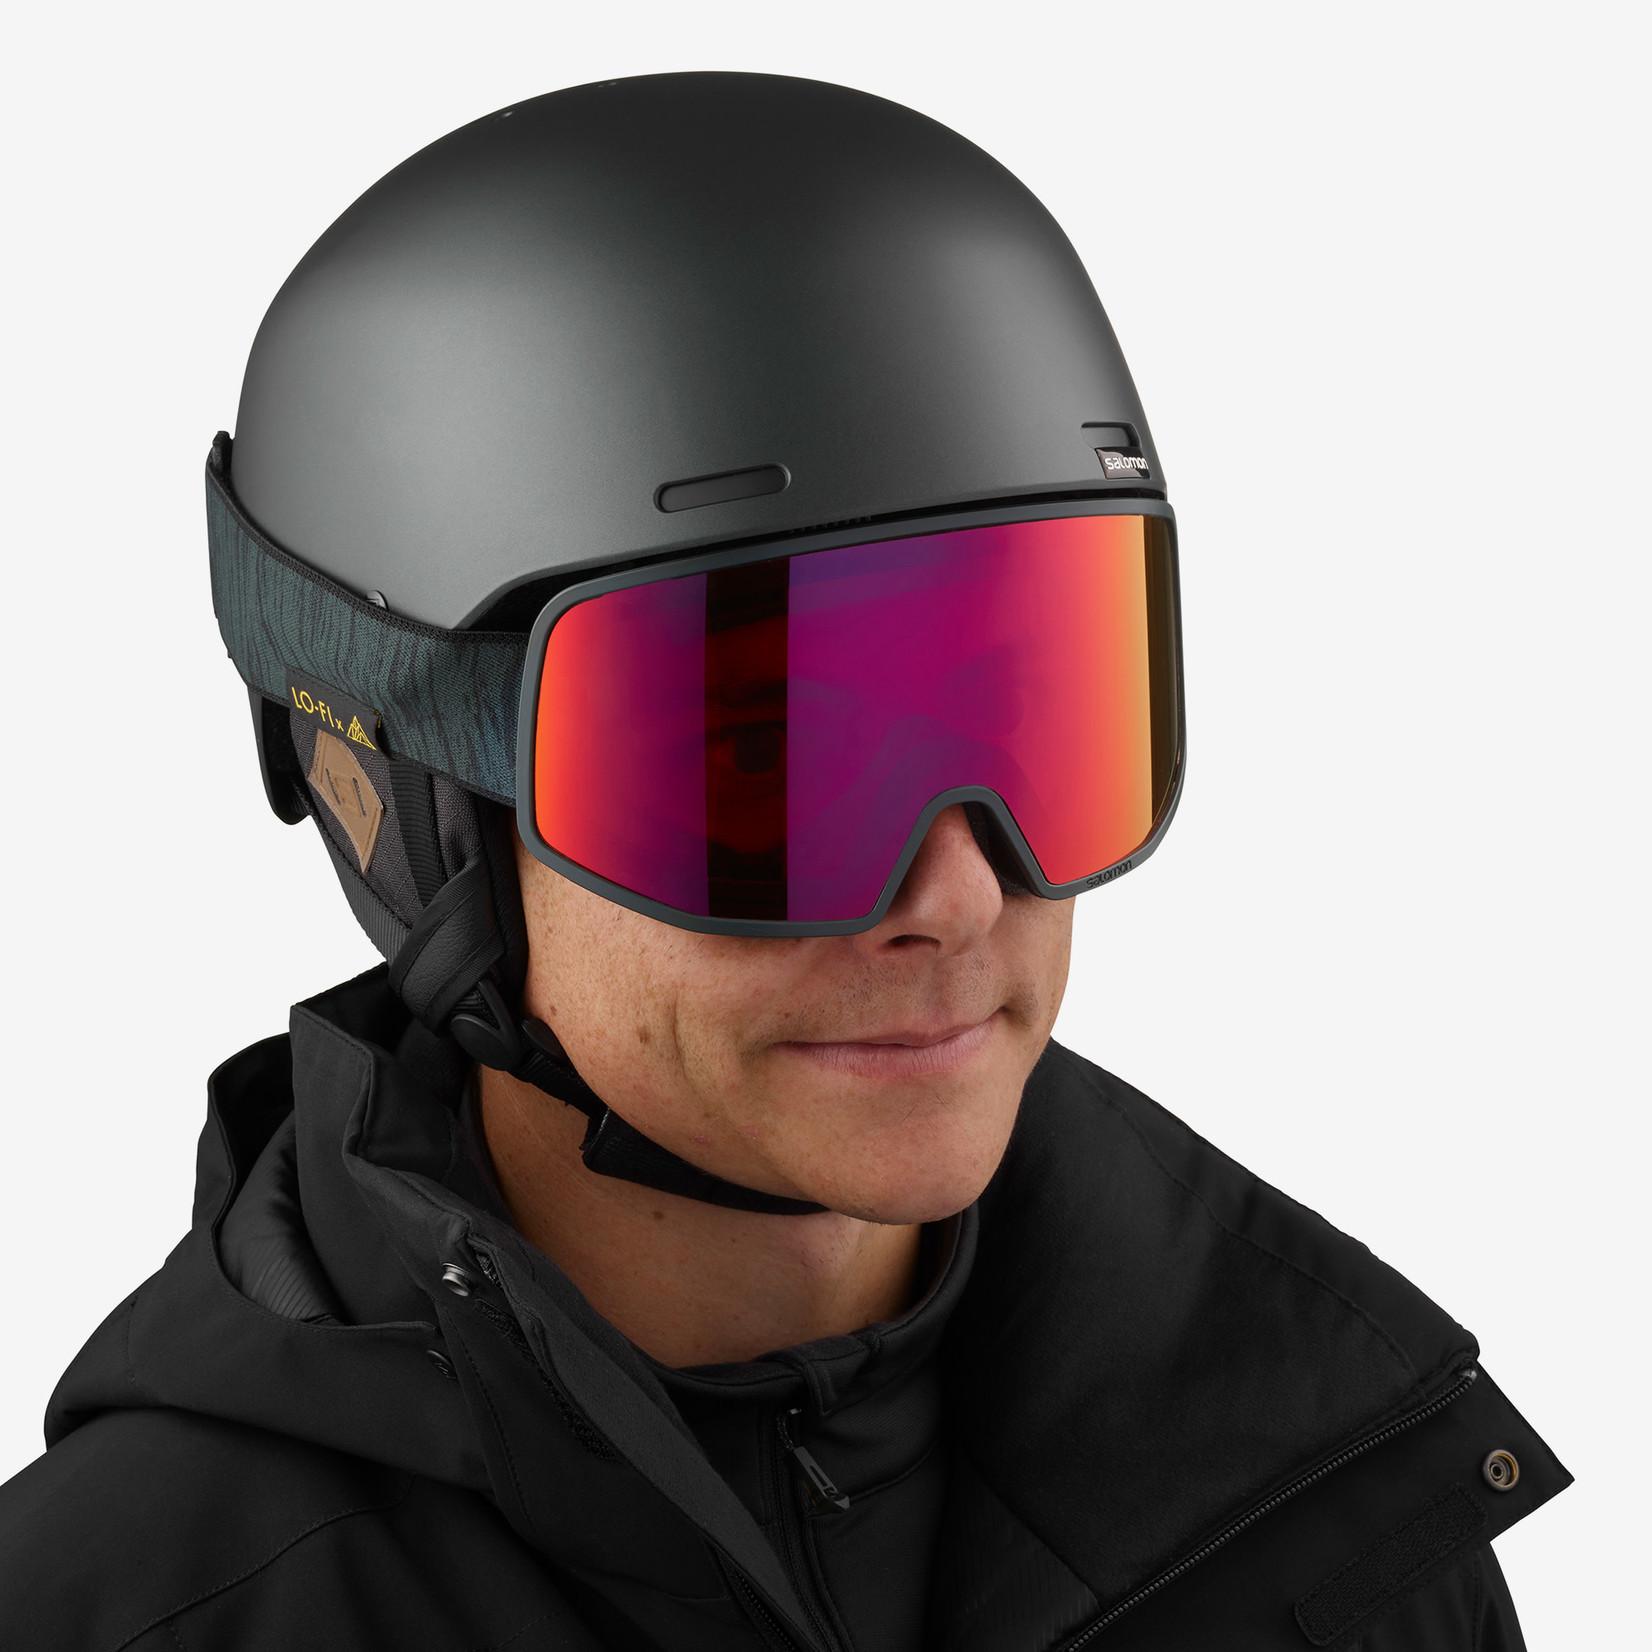 Salomon Lunettes de ski Salomon Lo Fi Sigma - Unisexe